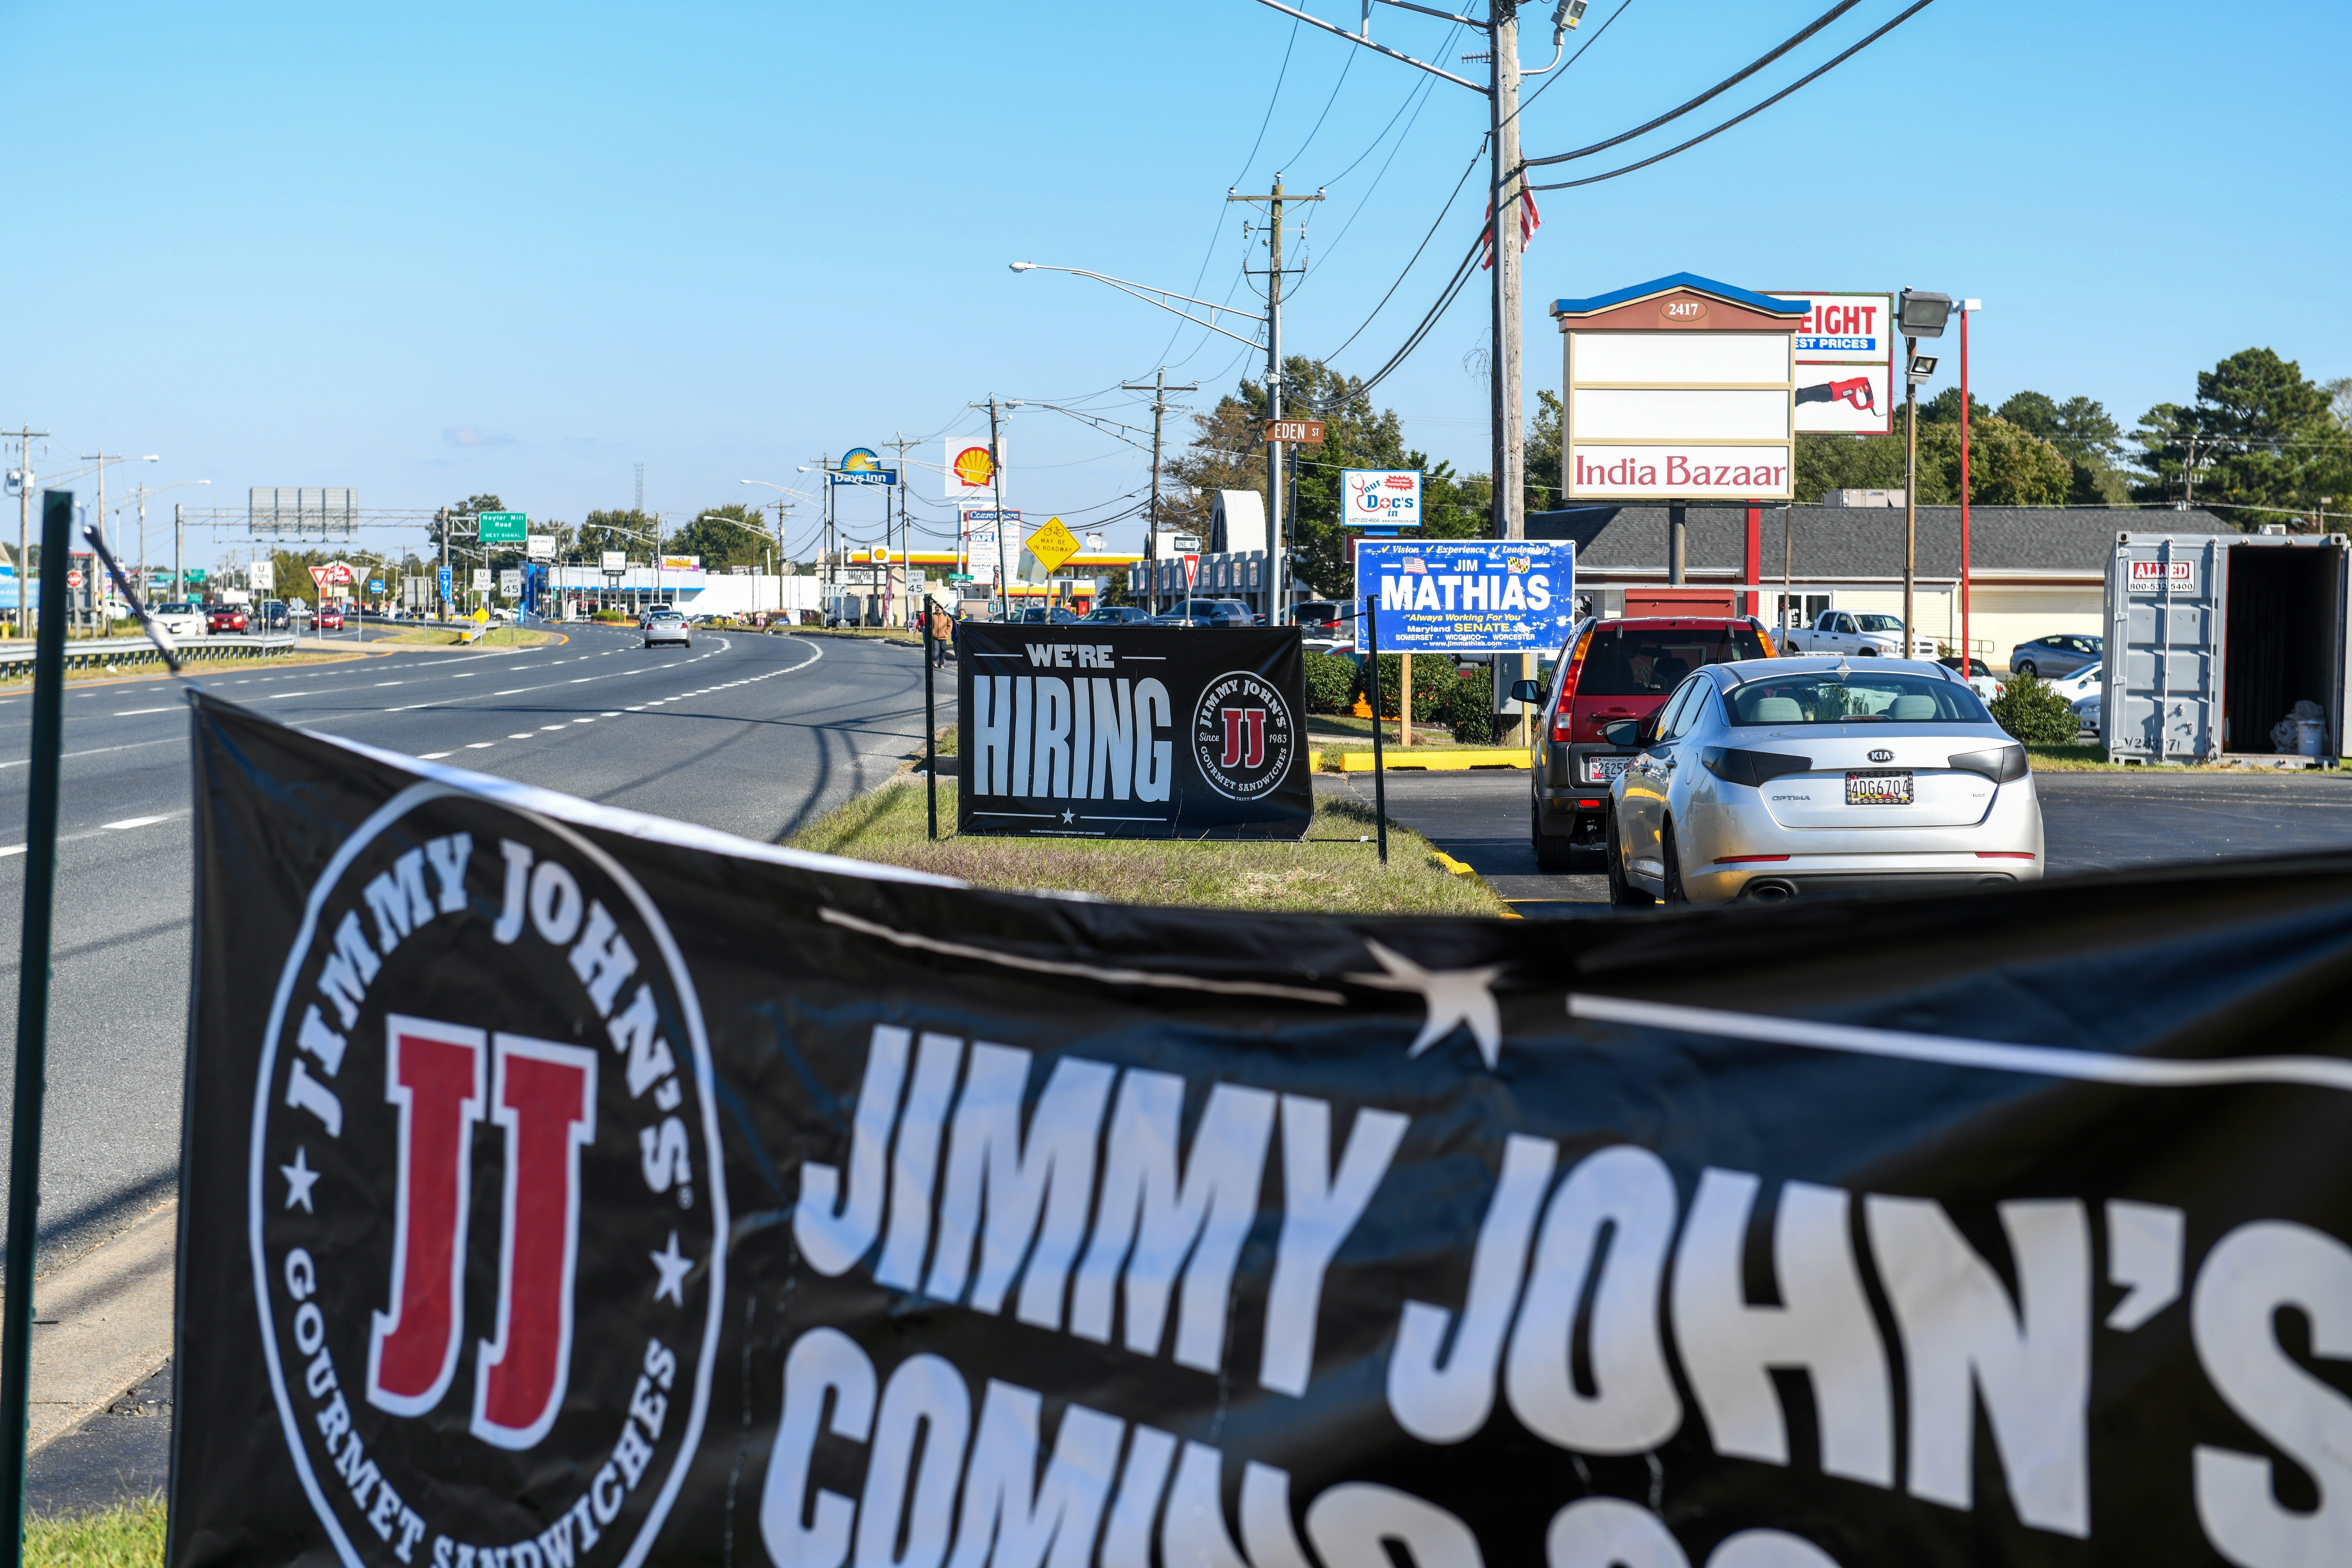 WATCH: New Jimmy John's coming to Salisbury